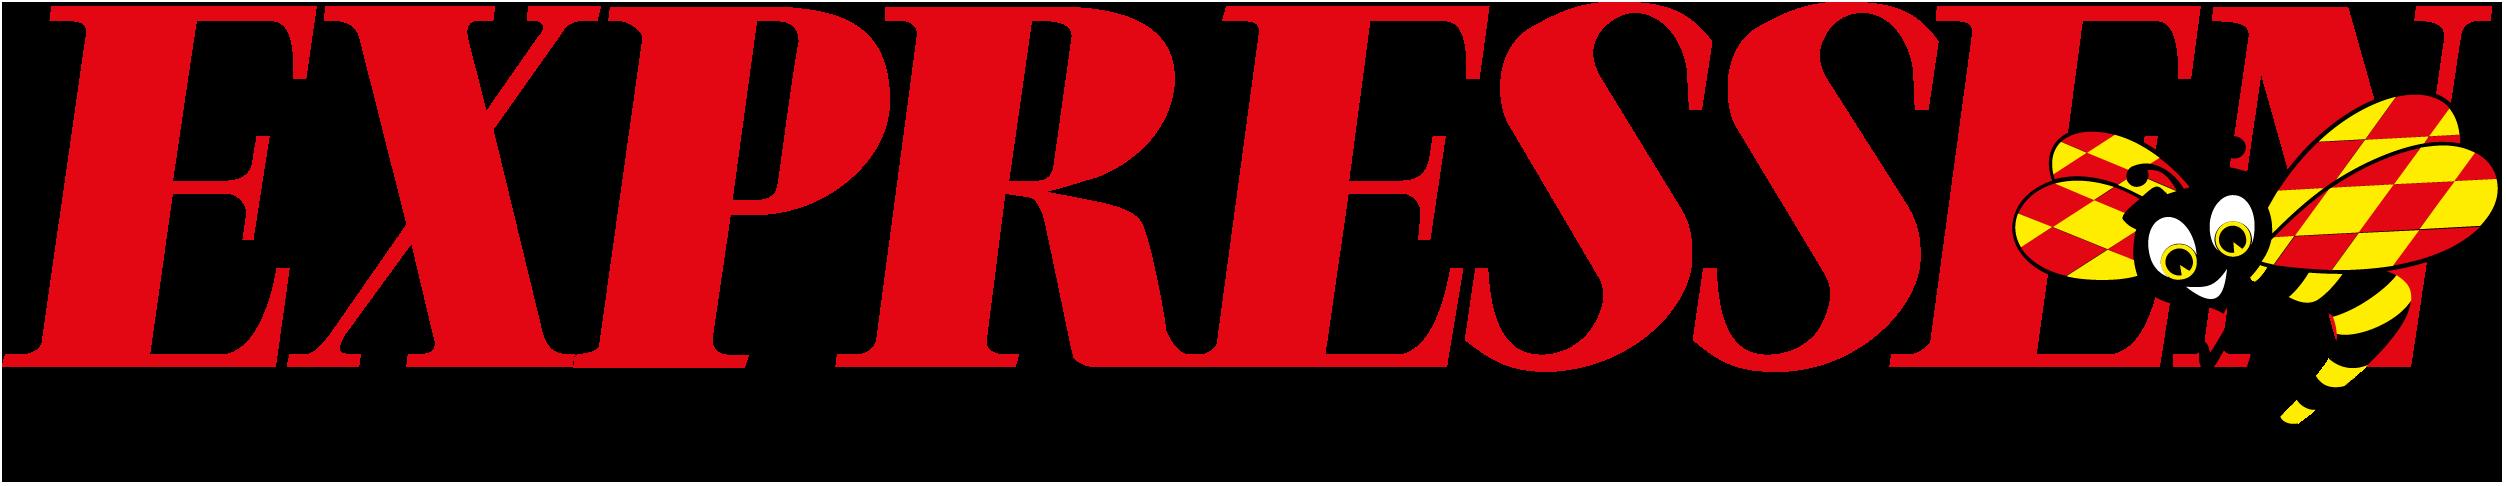 SE expressen logo